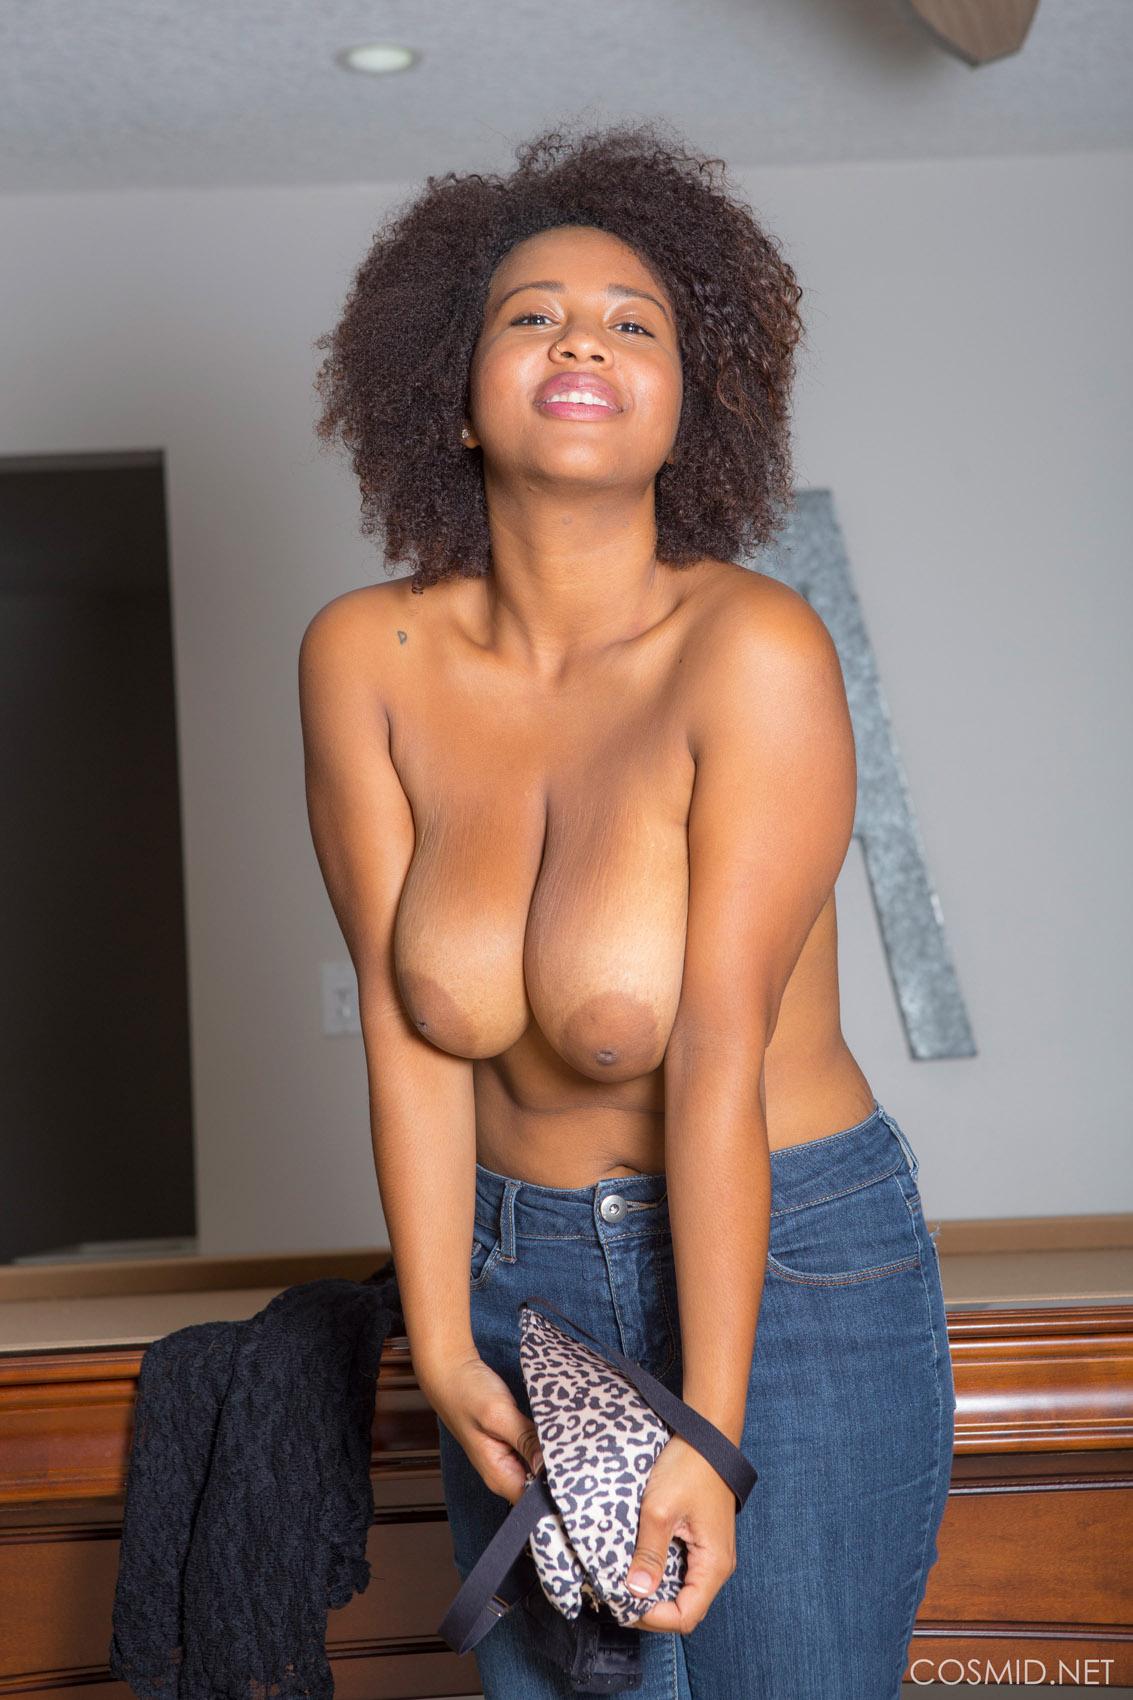 Very cute webcam girl from venezuela - 1 6